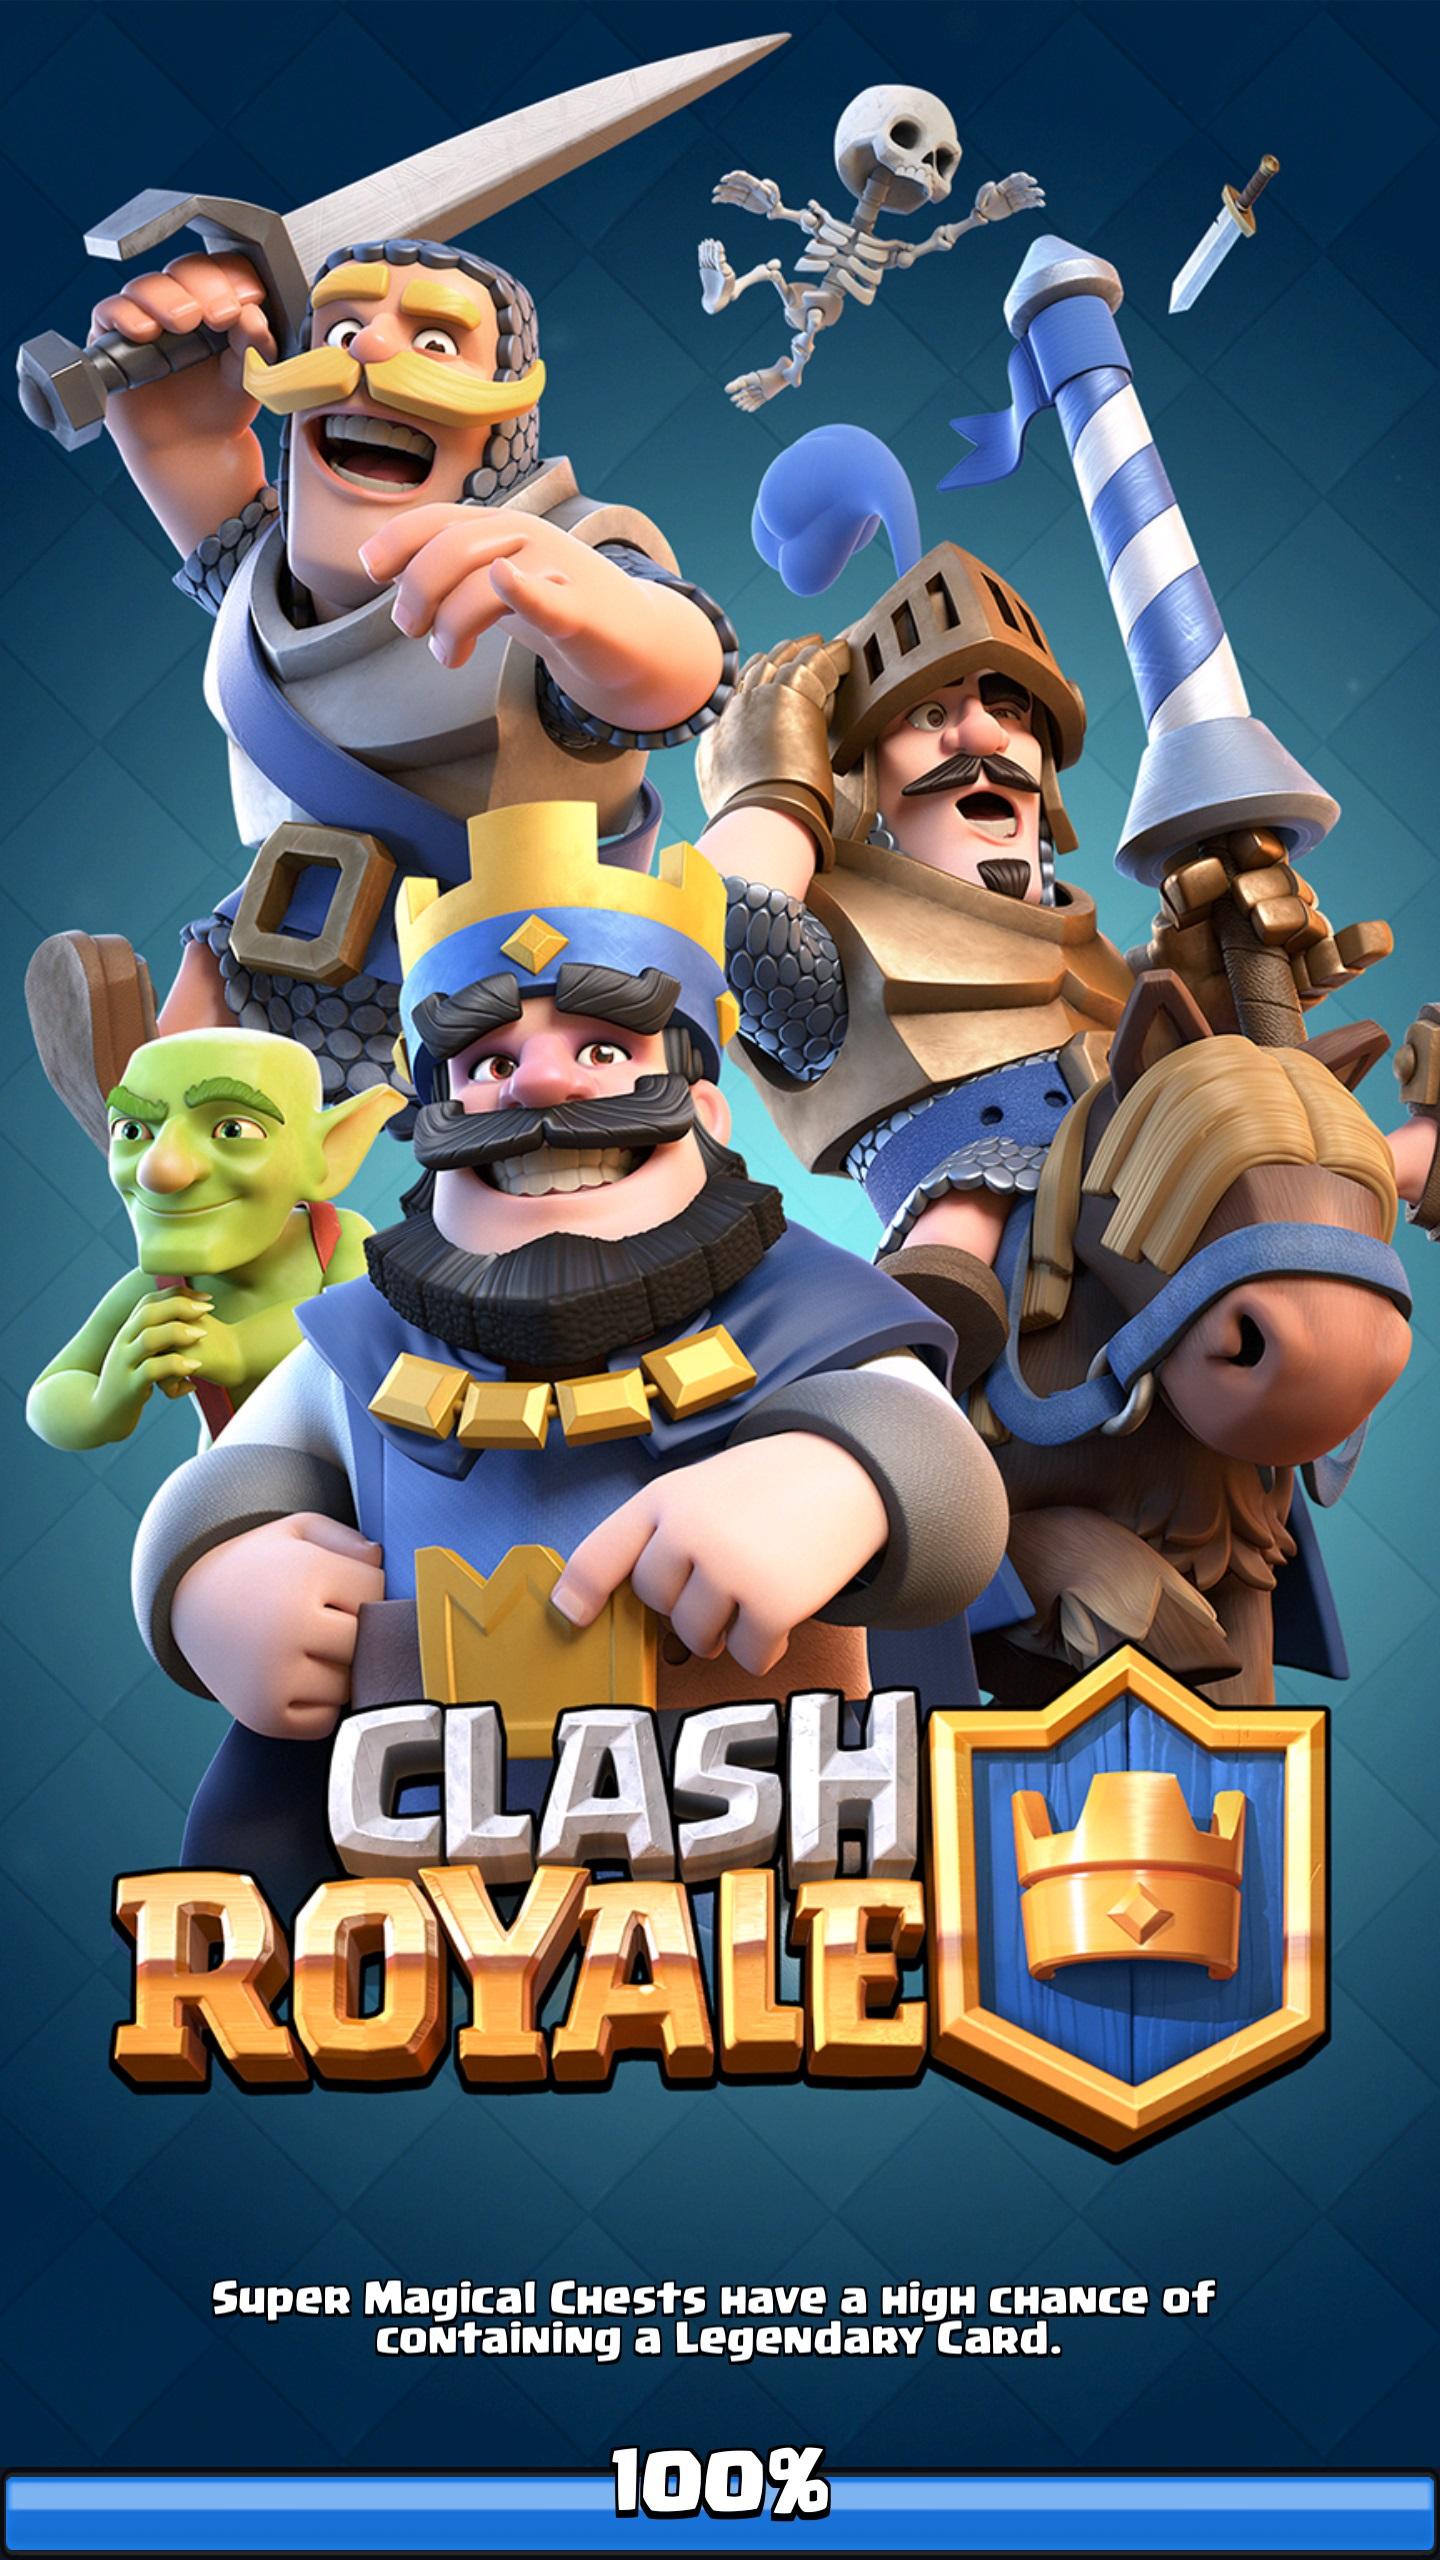 COL-Royale [ Clash Royale v1 9 2] mod apk 100% hack with all